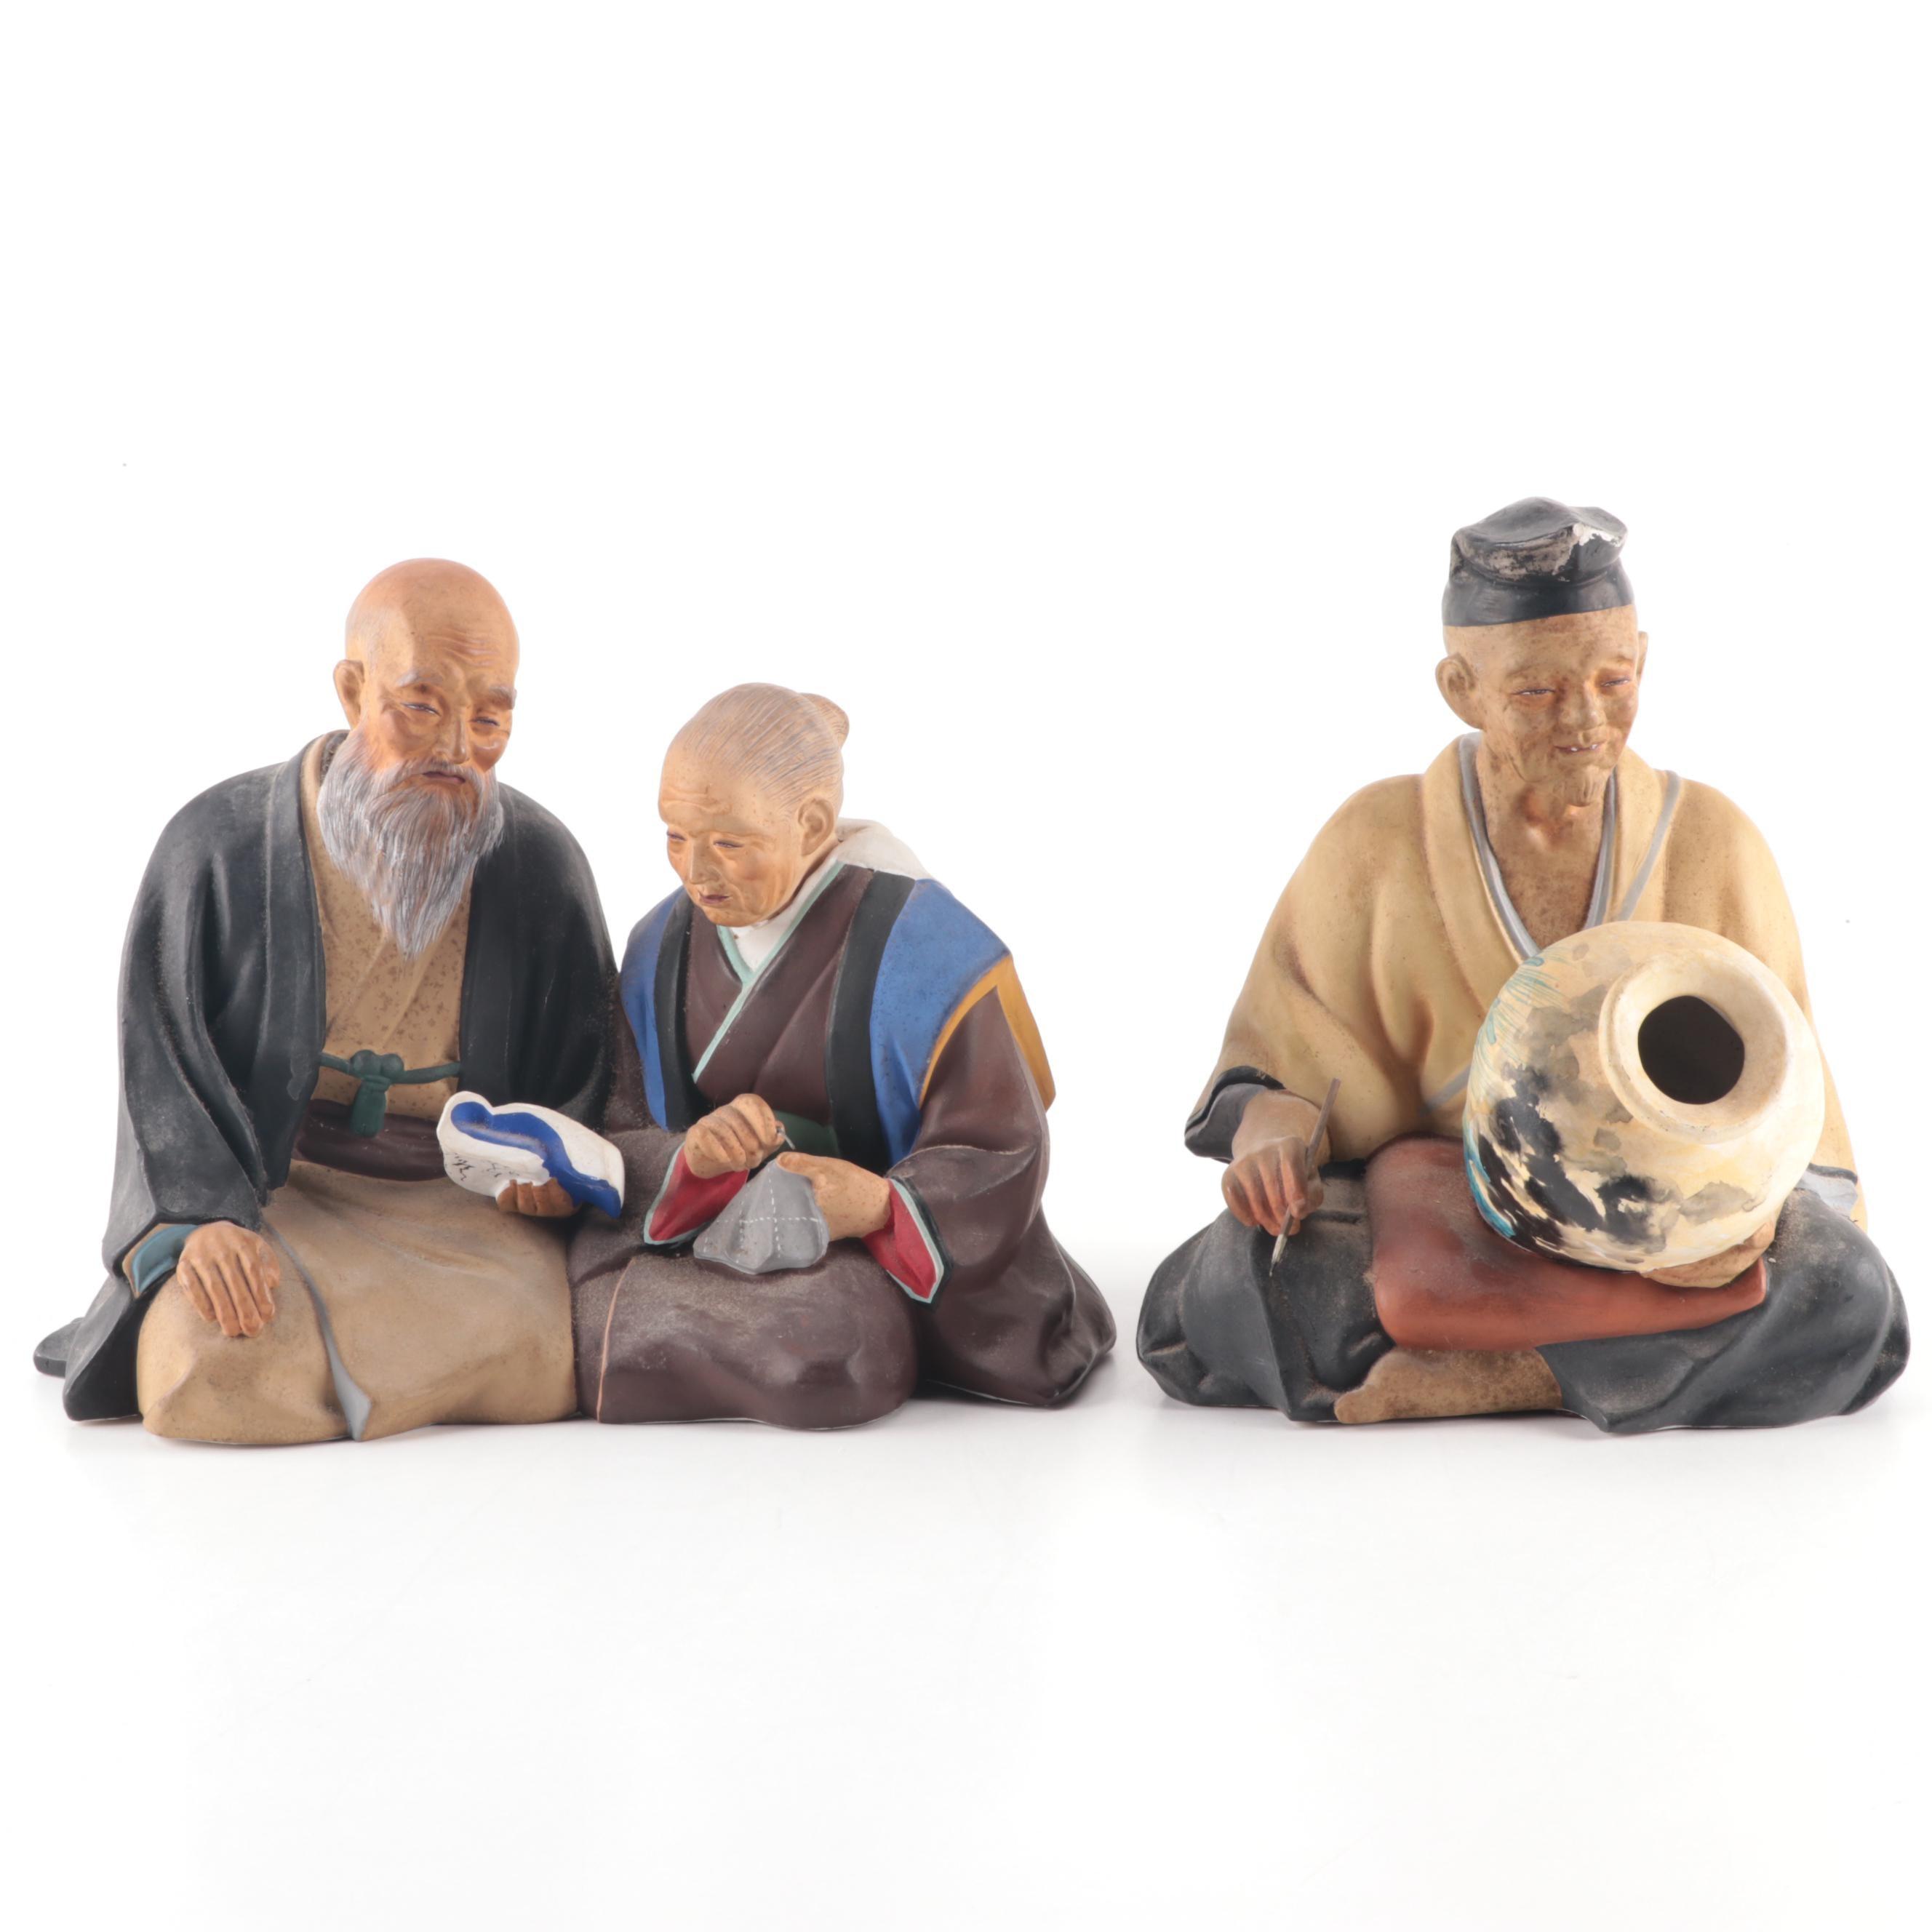 Japanese Hakata Urasaki Clay Dolls